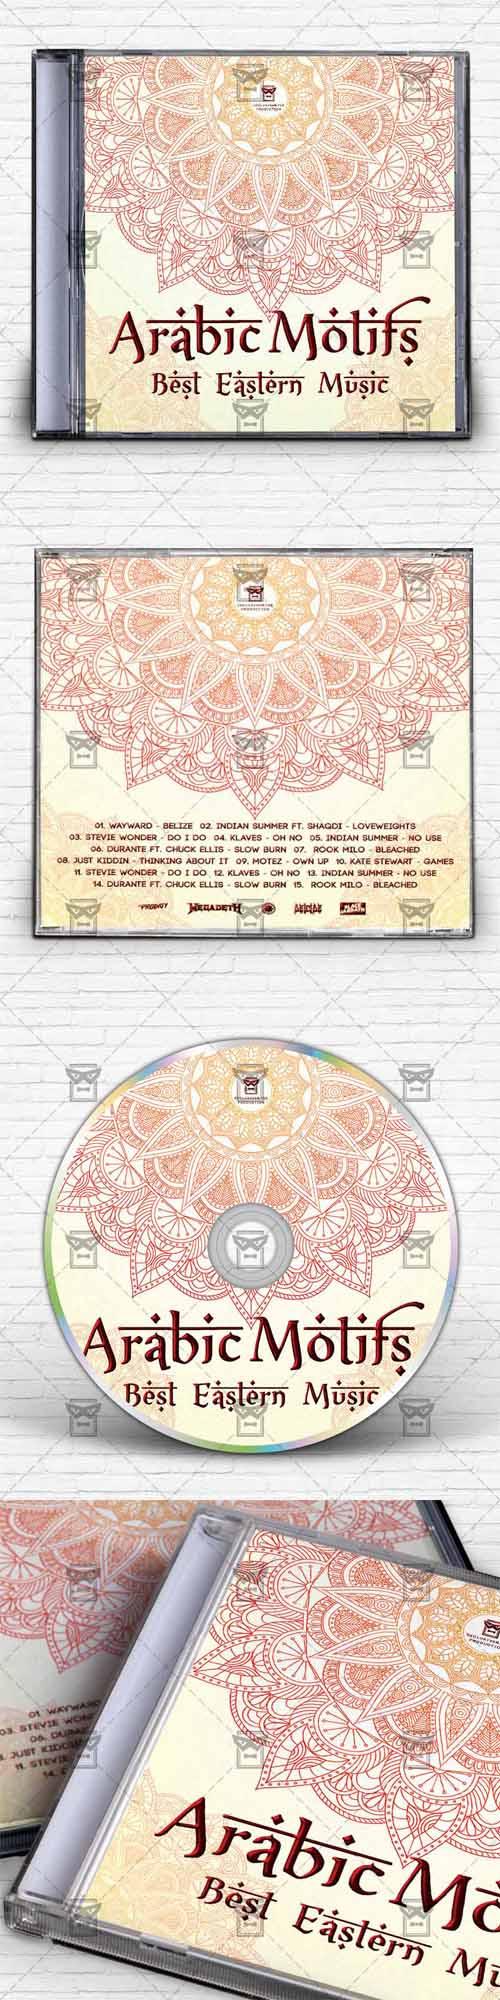 CD Cover Template - Arabic Motifs